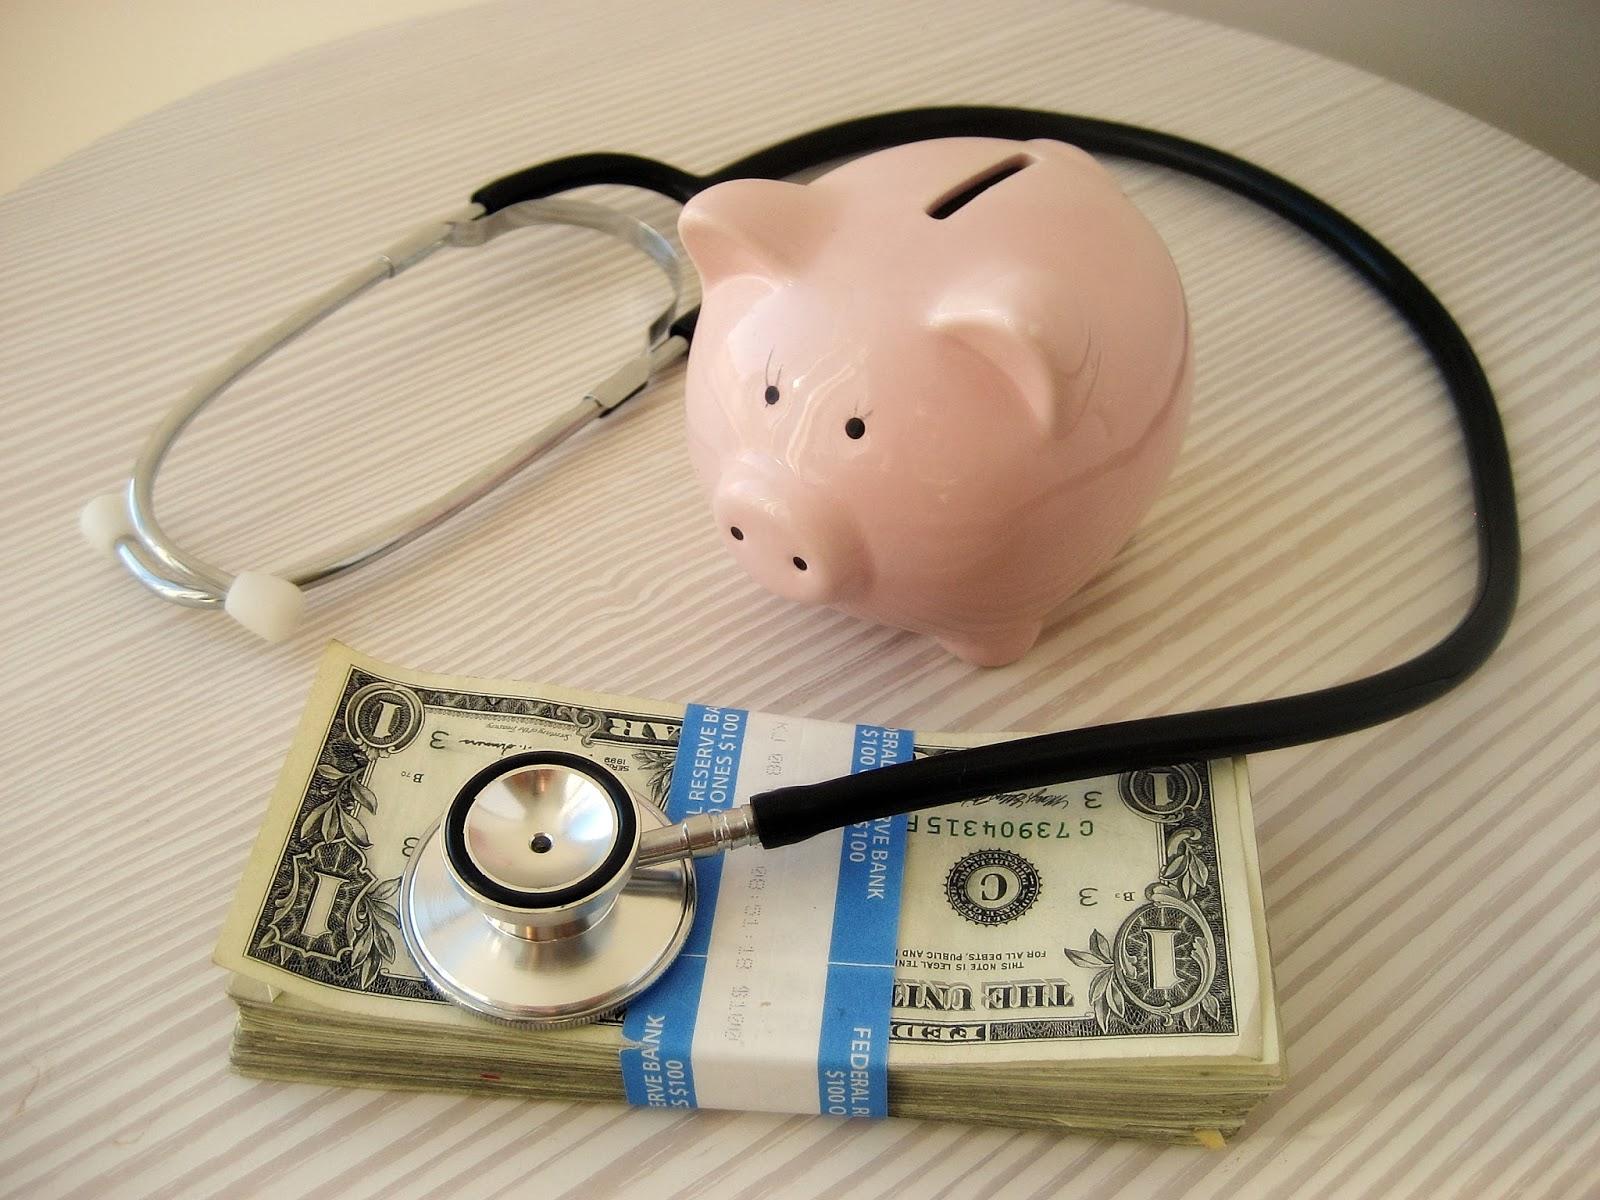 Group Health Insurance Plans